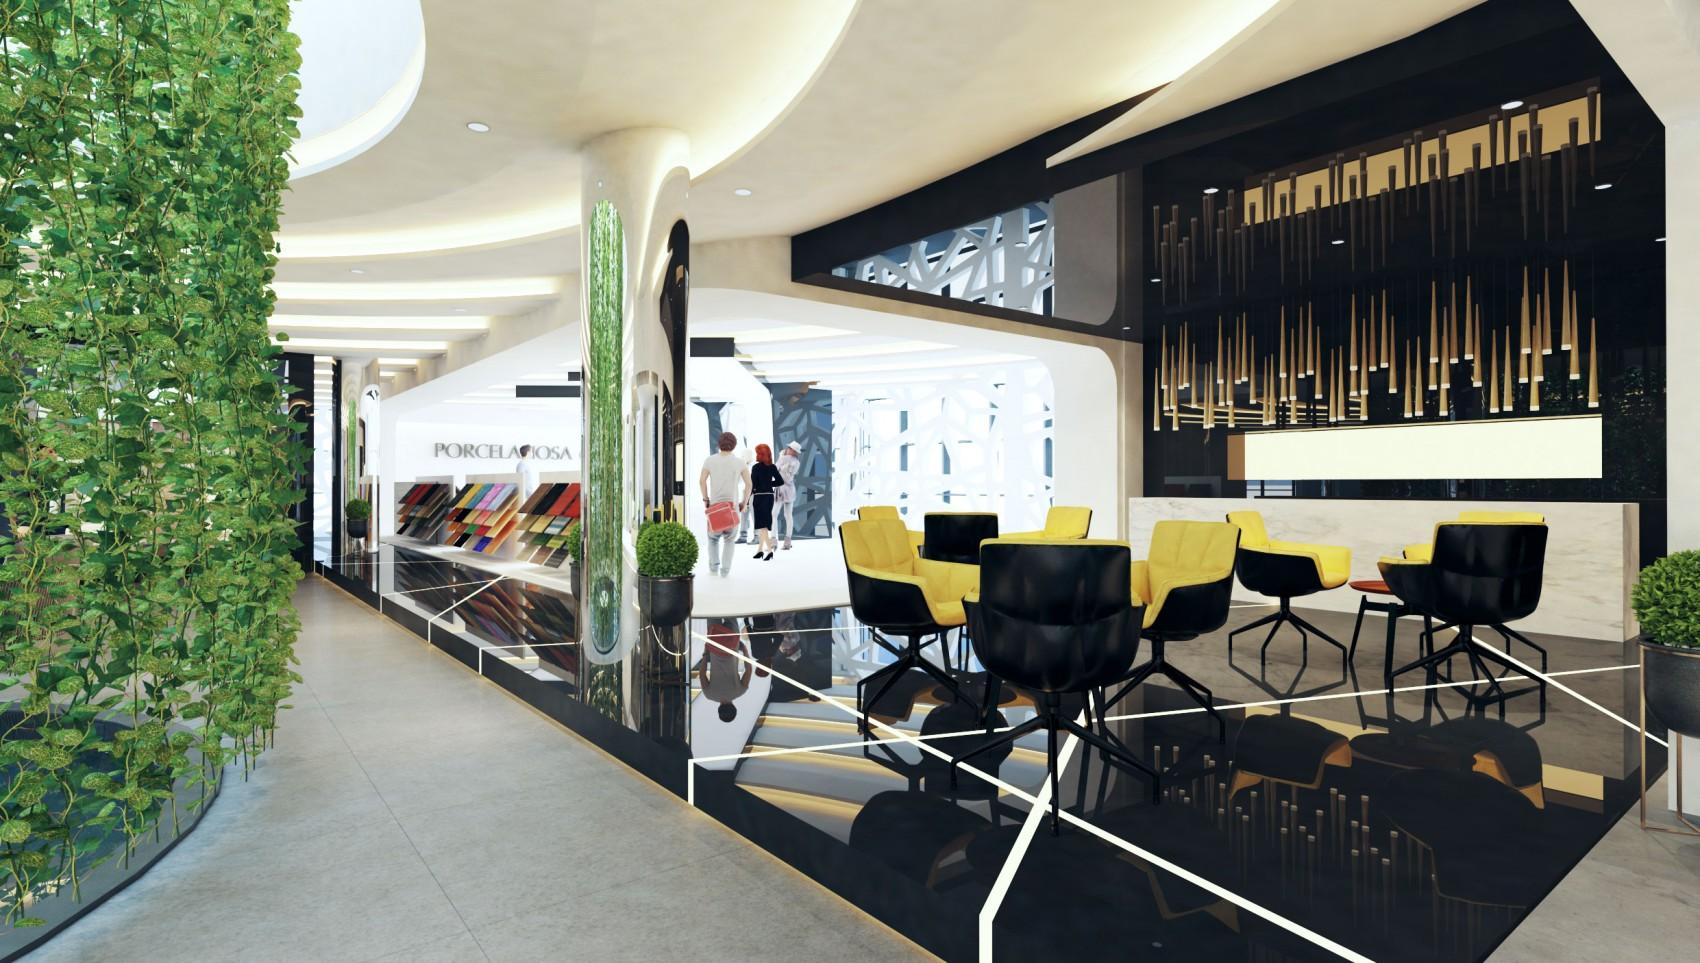 Finalistas en XI Premios Arquitectura e Interiorismo Porcelanosa